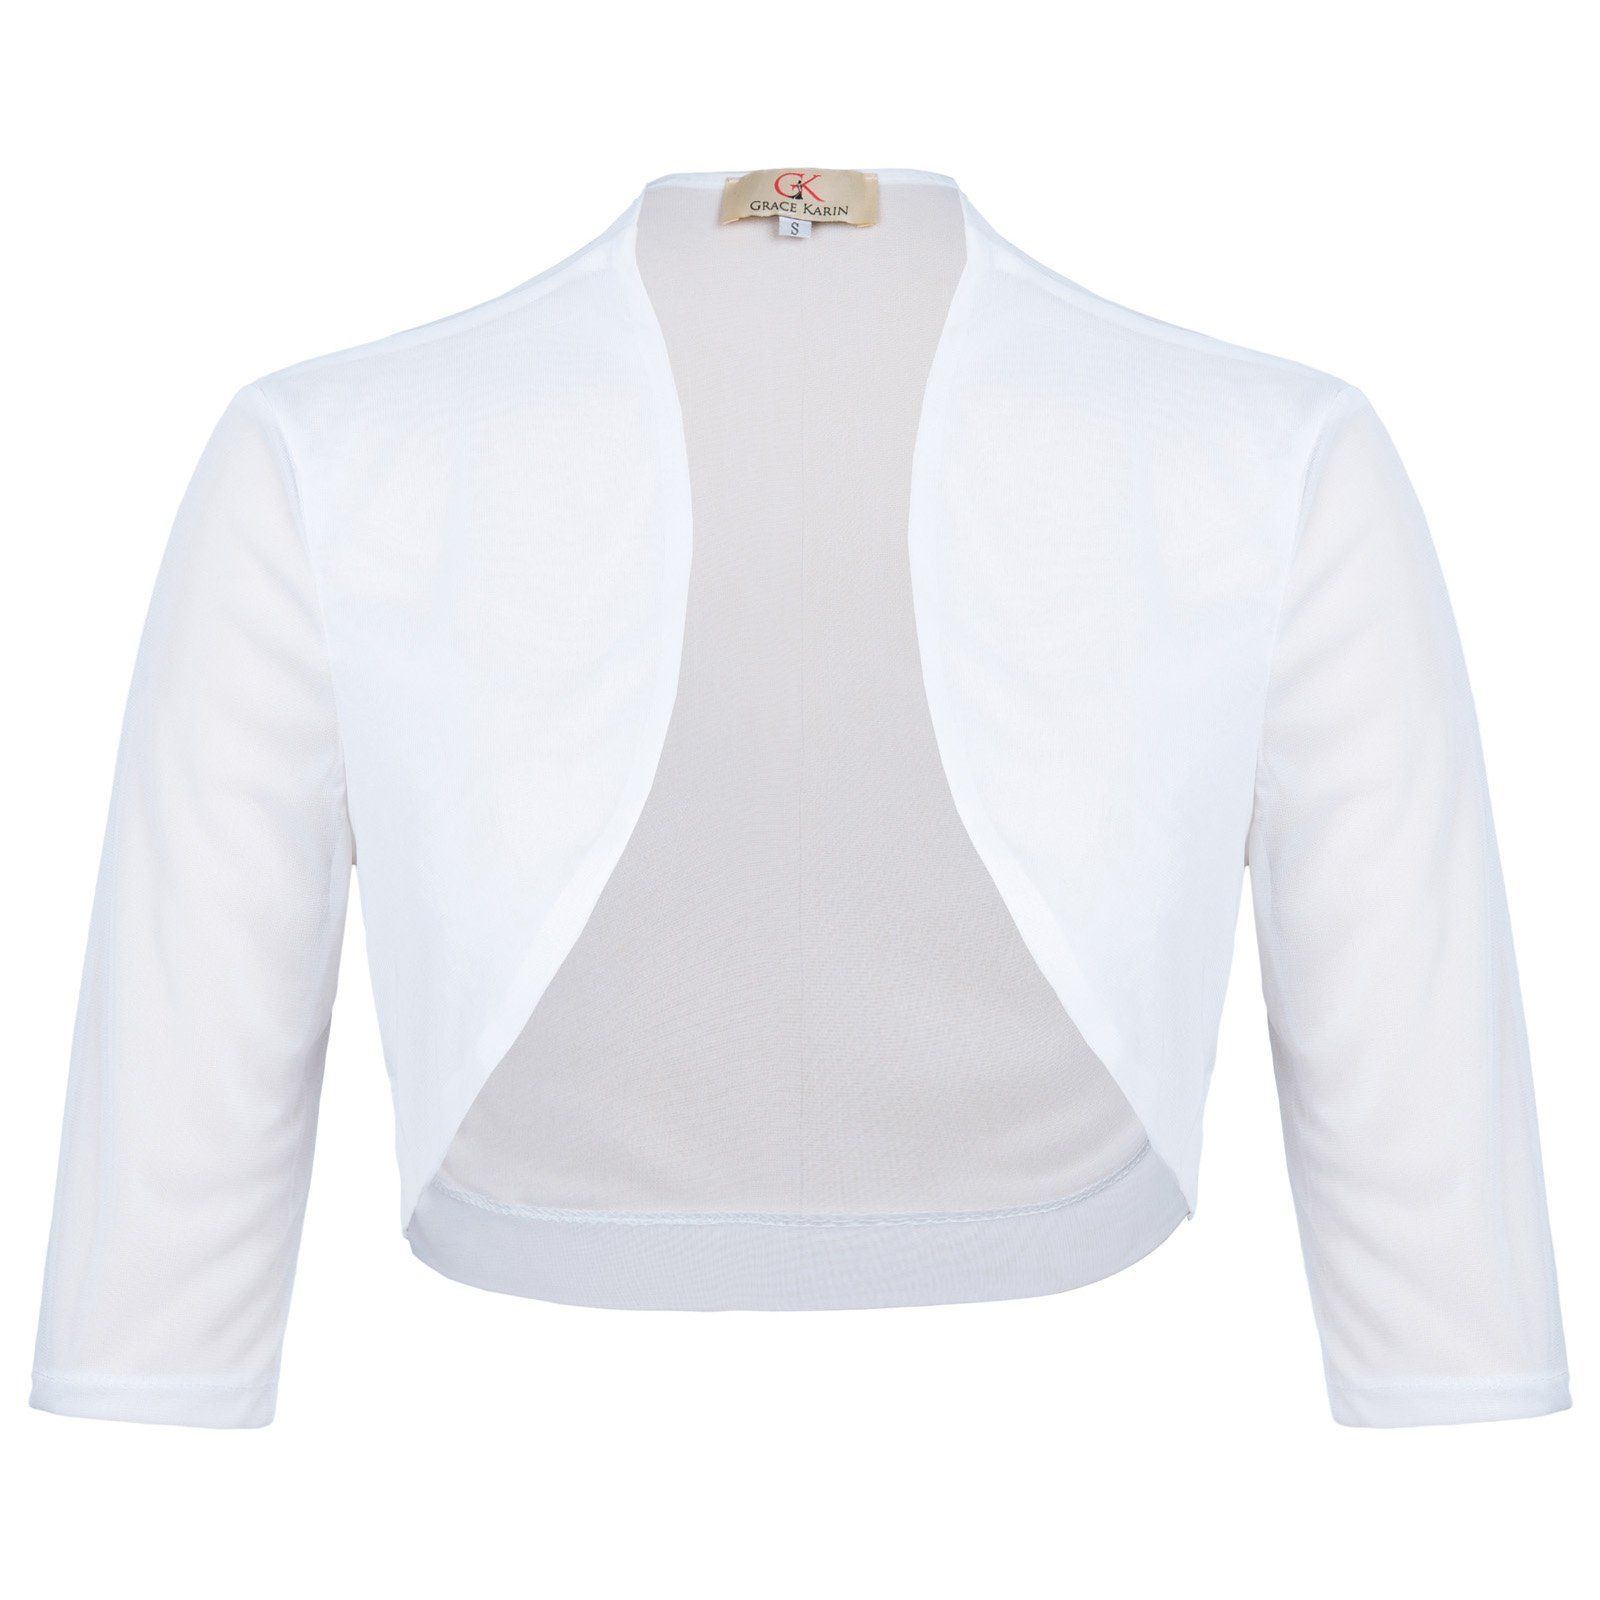 GRACE KARIN Chiffon Half Sleeve Short Women Bolero Shrug White Size M CL010473